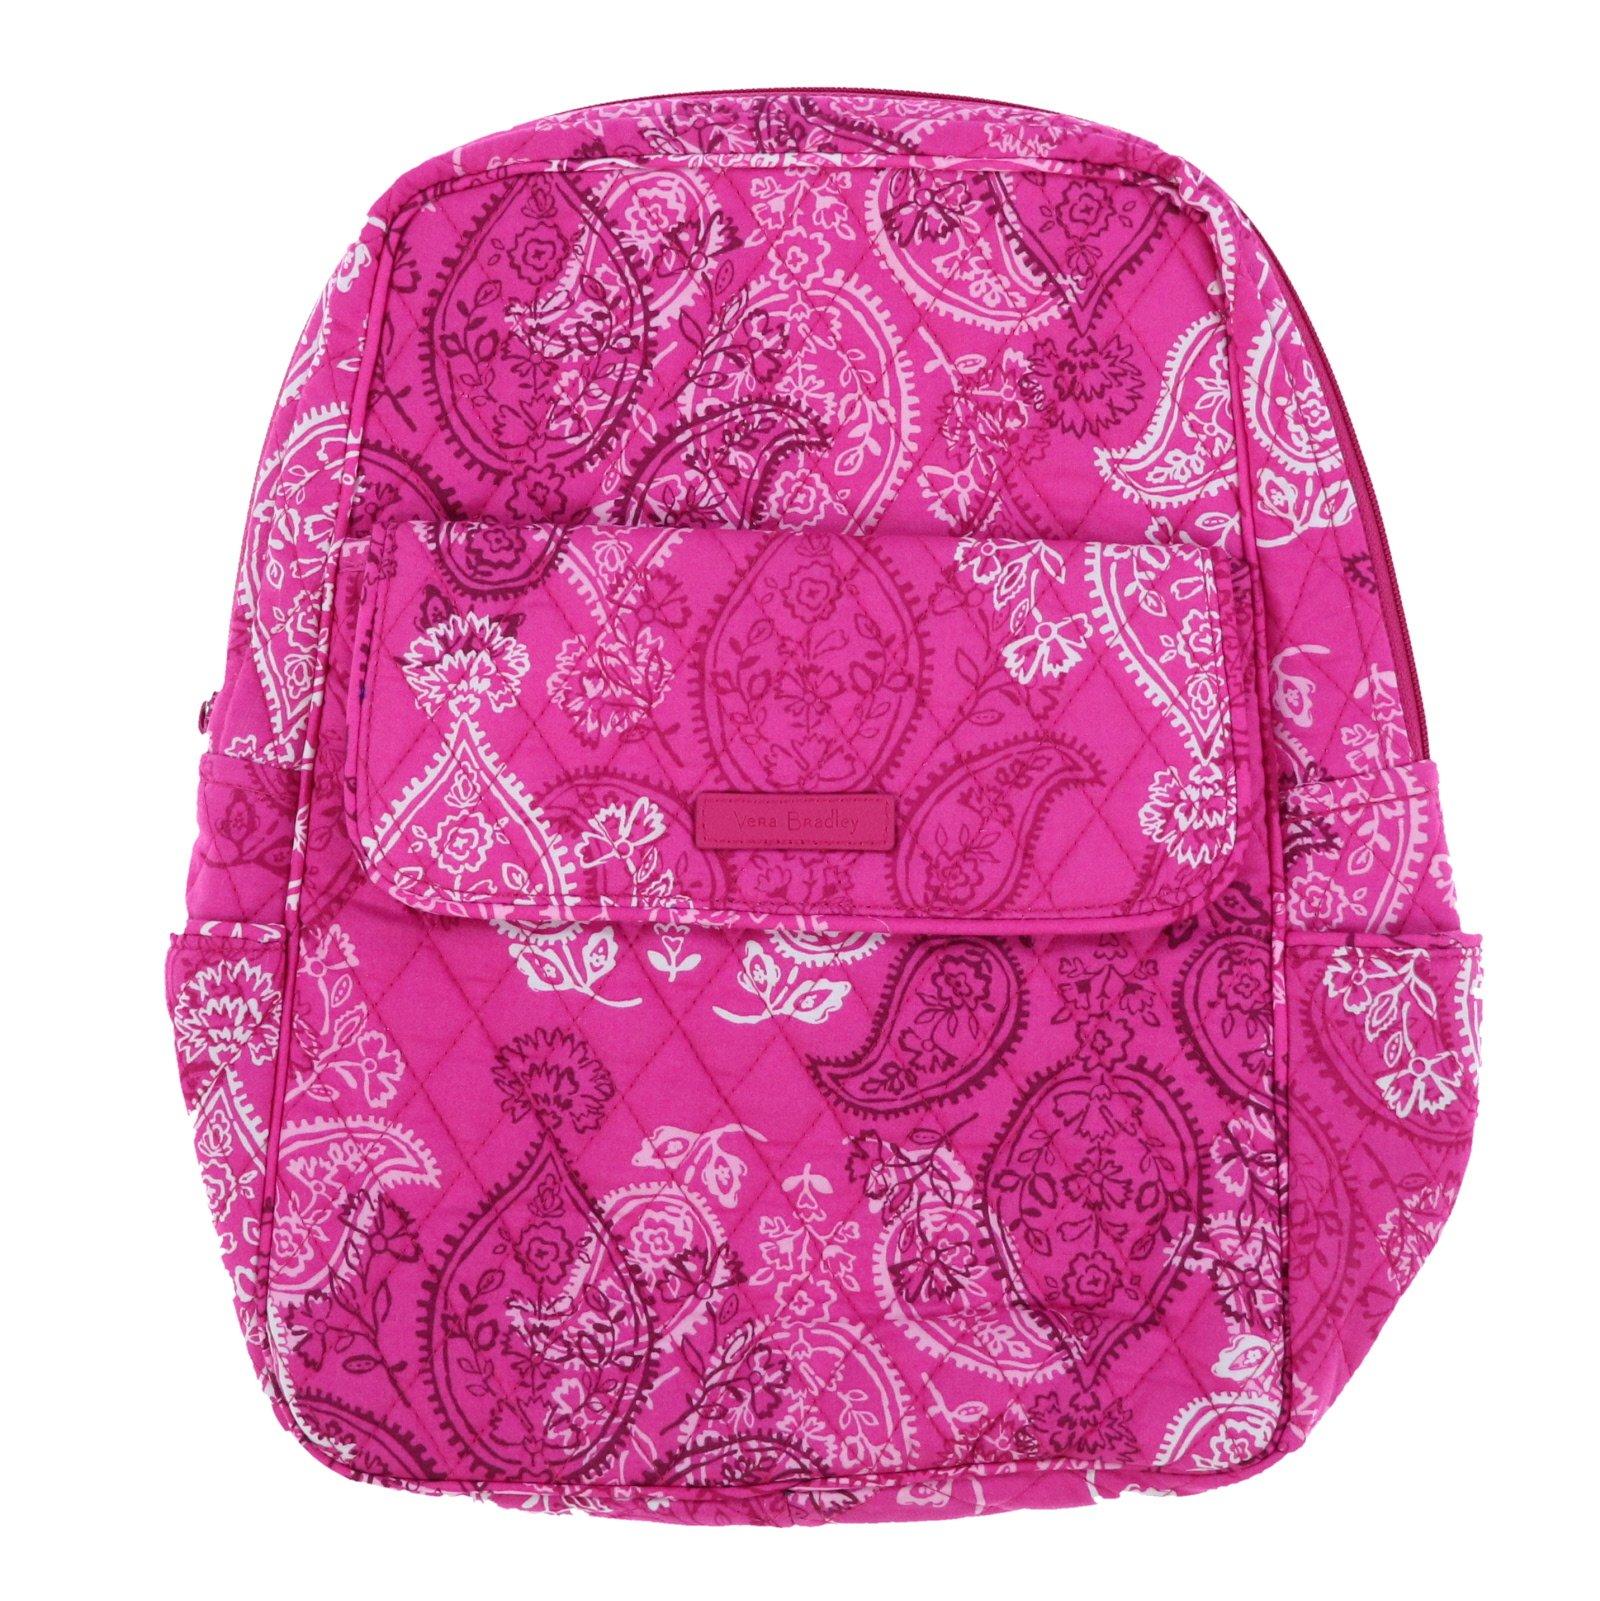 Vera Bradley Backpack (Stamped Paisley) by Vera Bradley